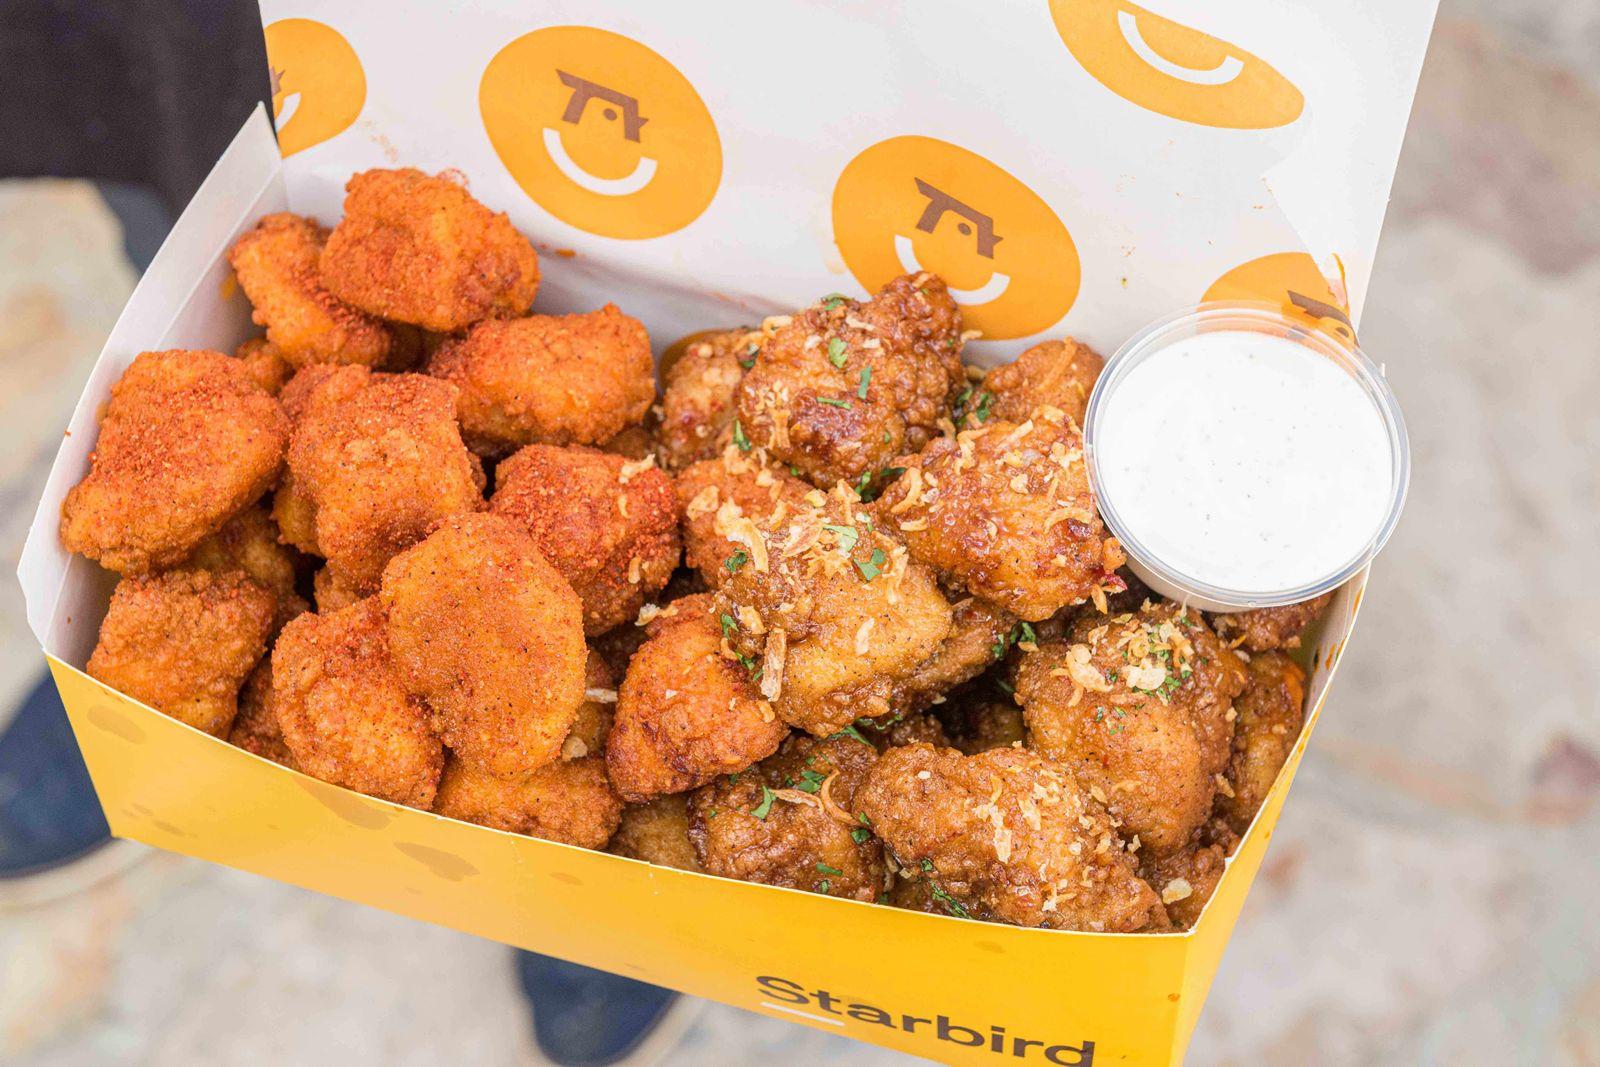 Starbird Chicken Opens Ninth Location in San Francisco Bay Area